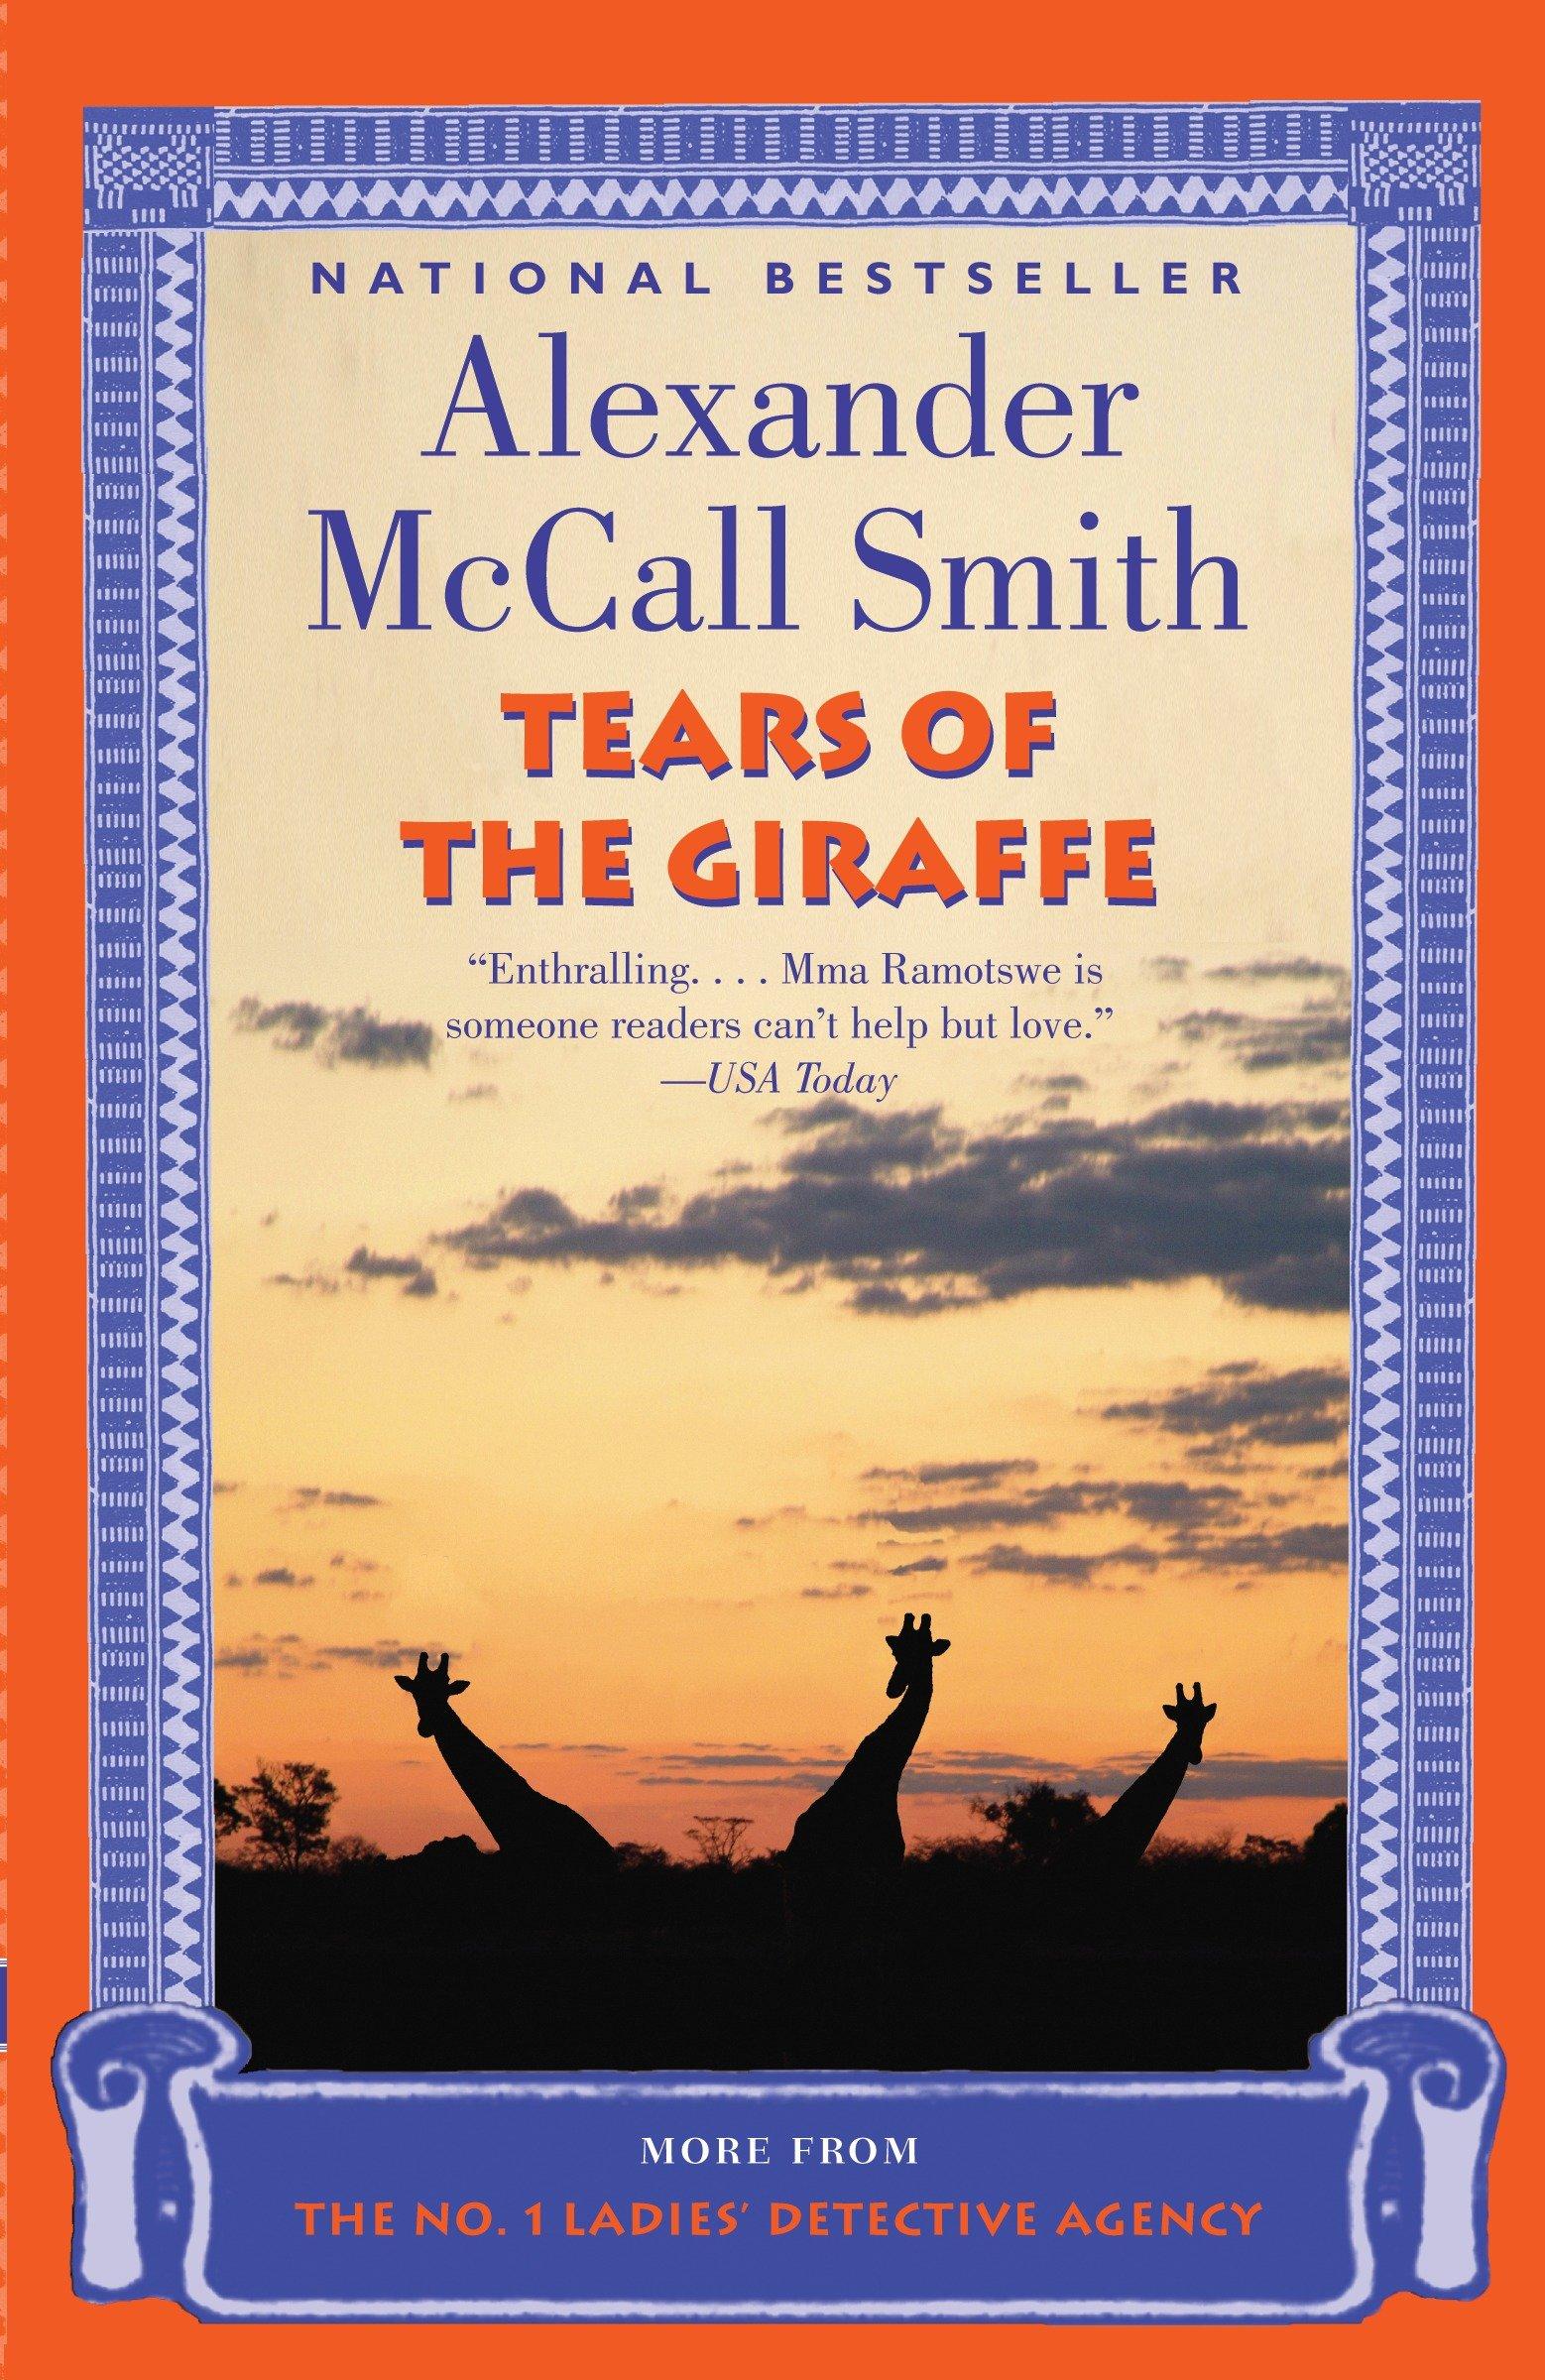 Tears of the Giraffe A No. 1 Ladies' Detective Agency Novel (2)